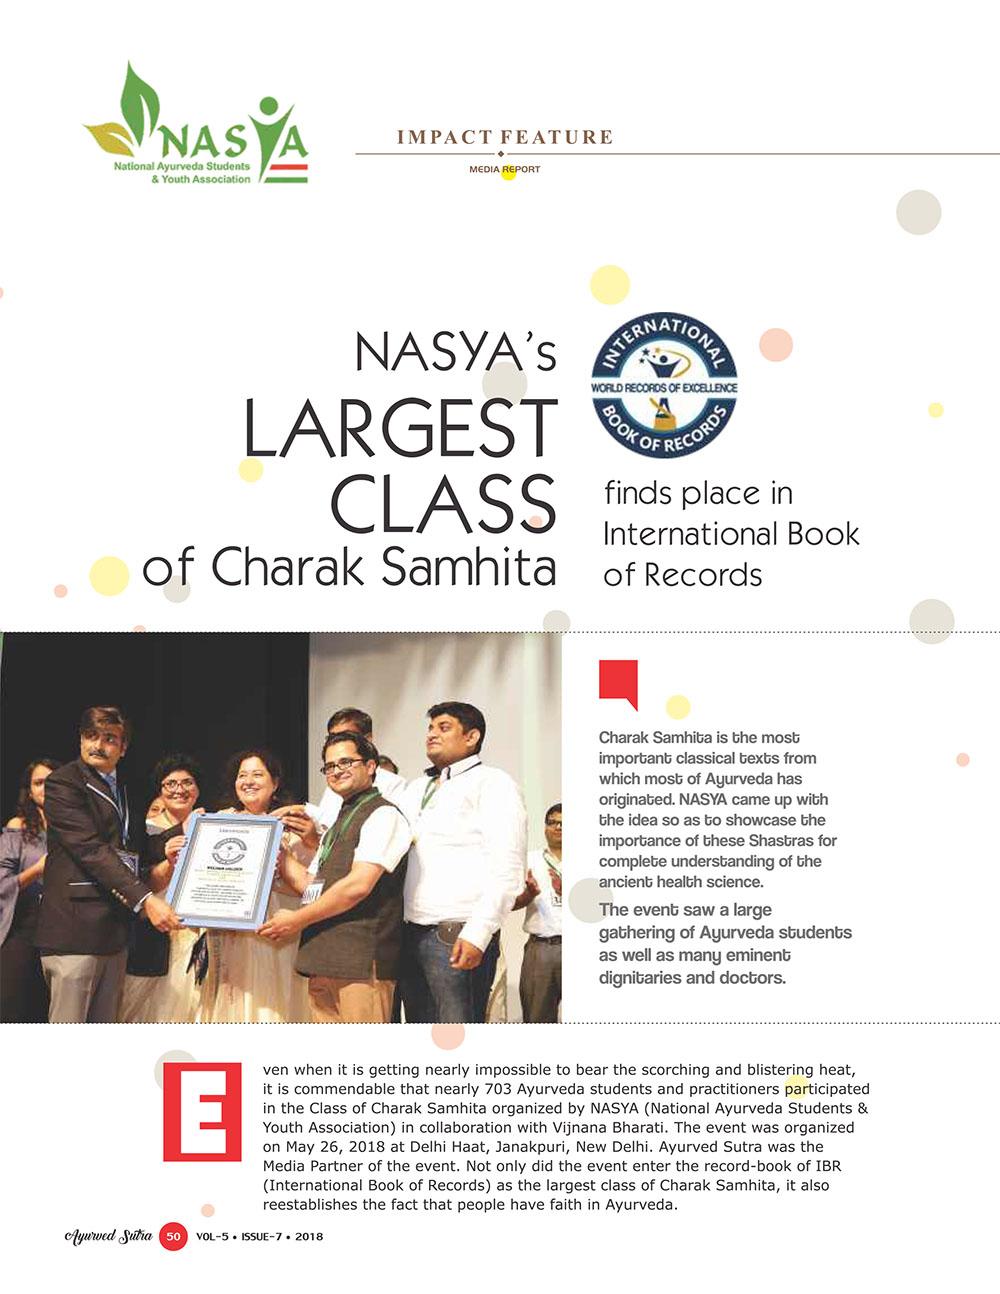 Ayurvedsutra Vol 05 issue 07 52 - NASYA's Largest Class of Charak Samhita